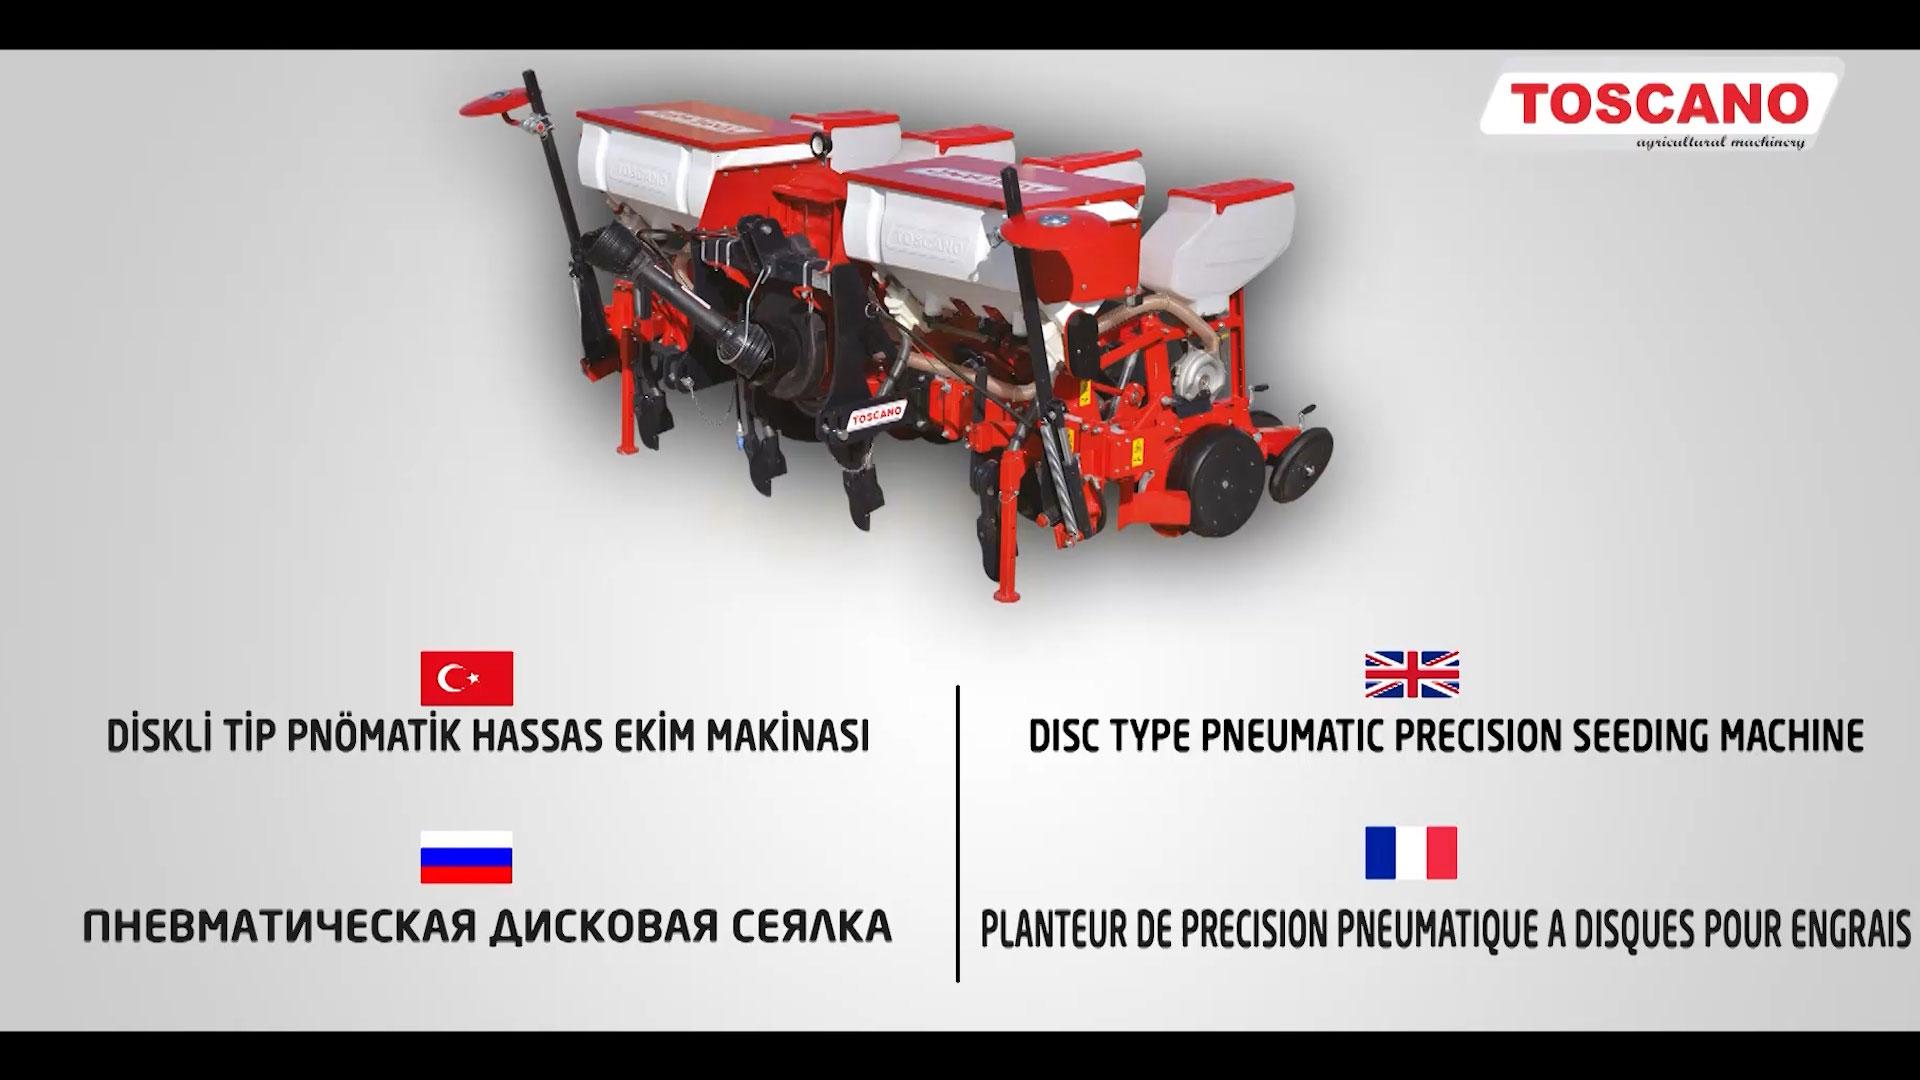 TOSCANO  Disc Type Pneumatic Precision Seeding Machine